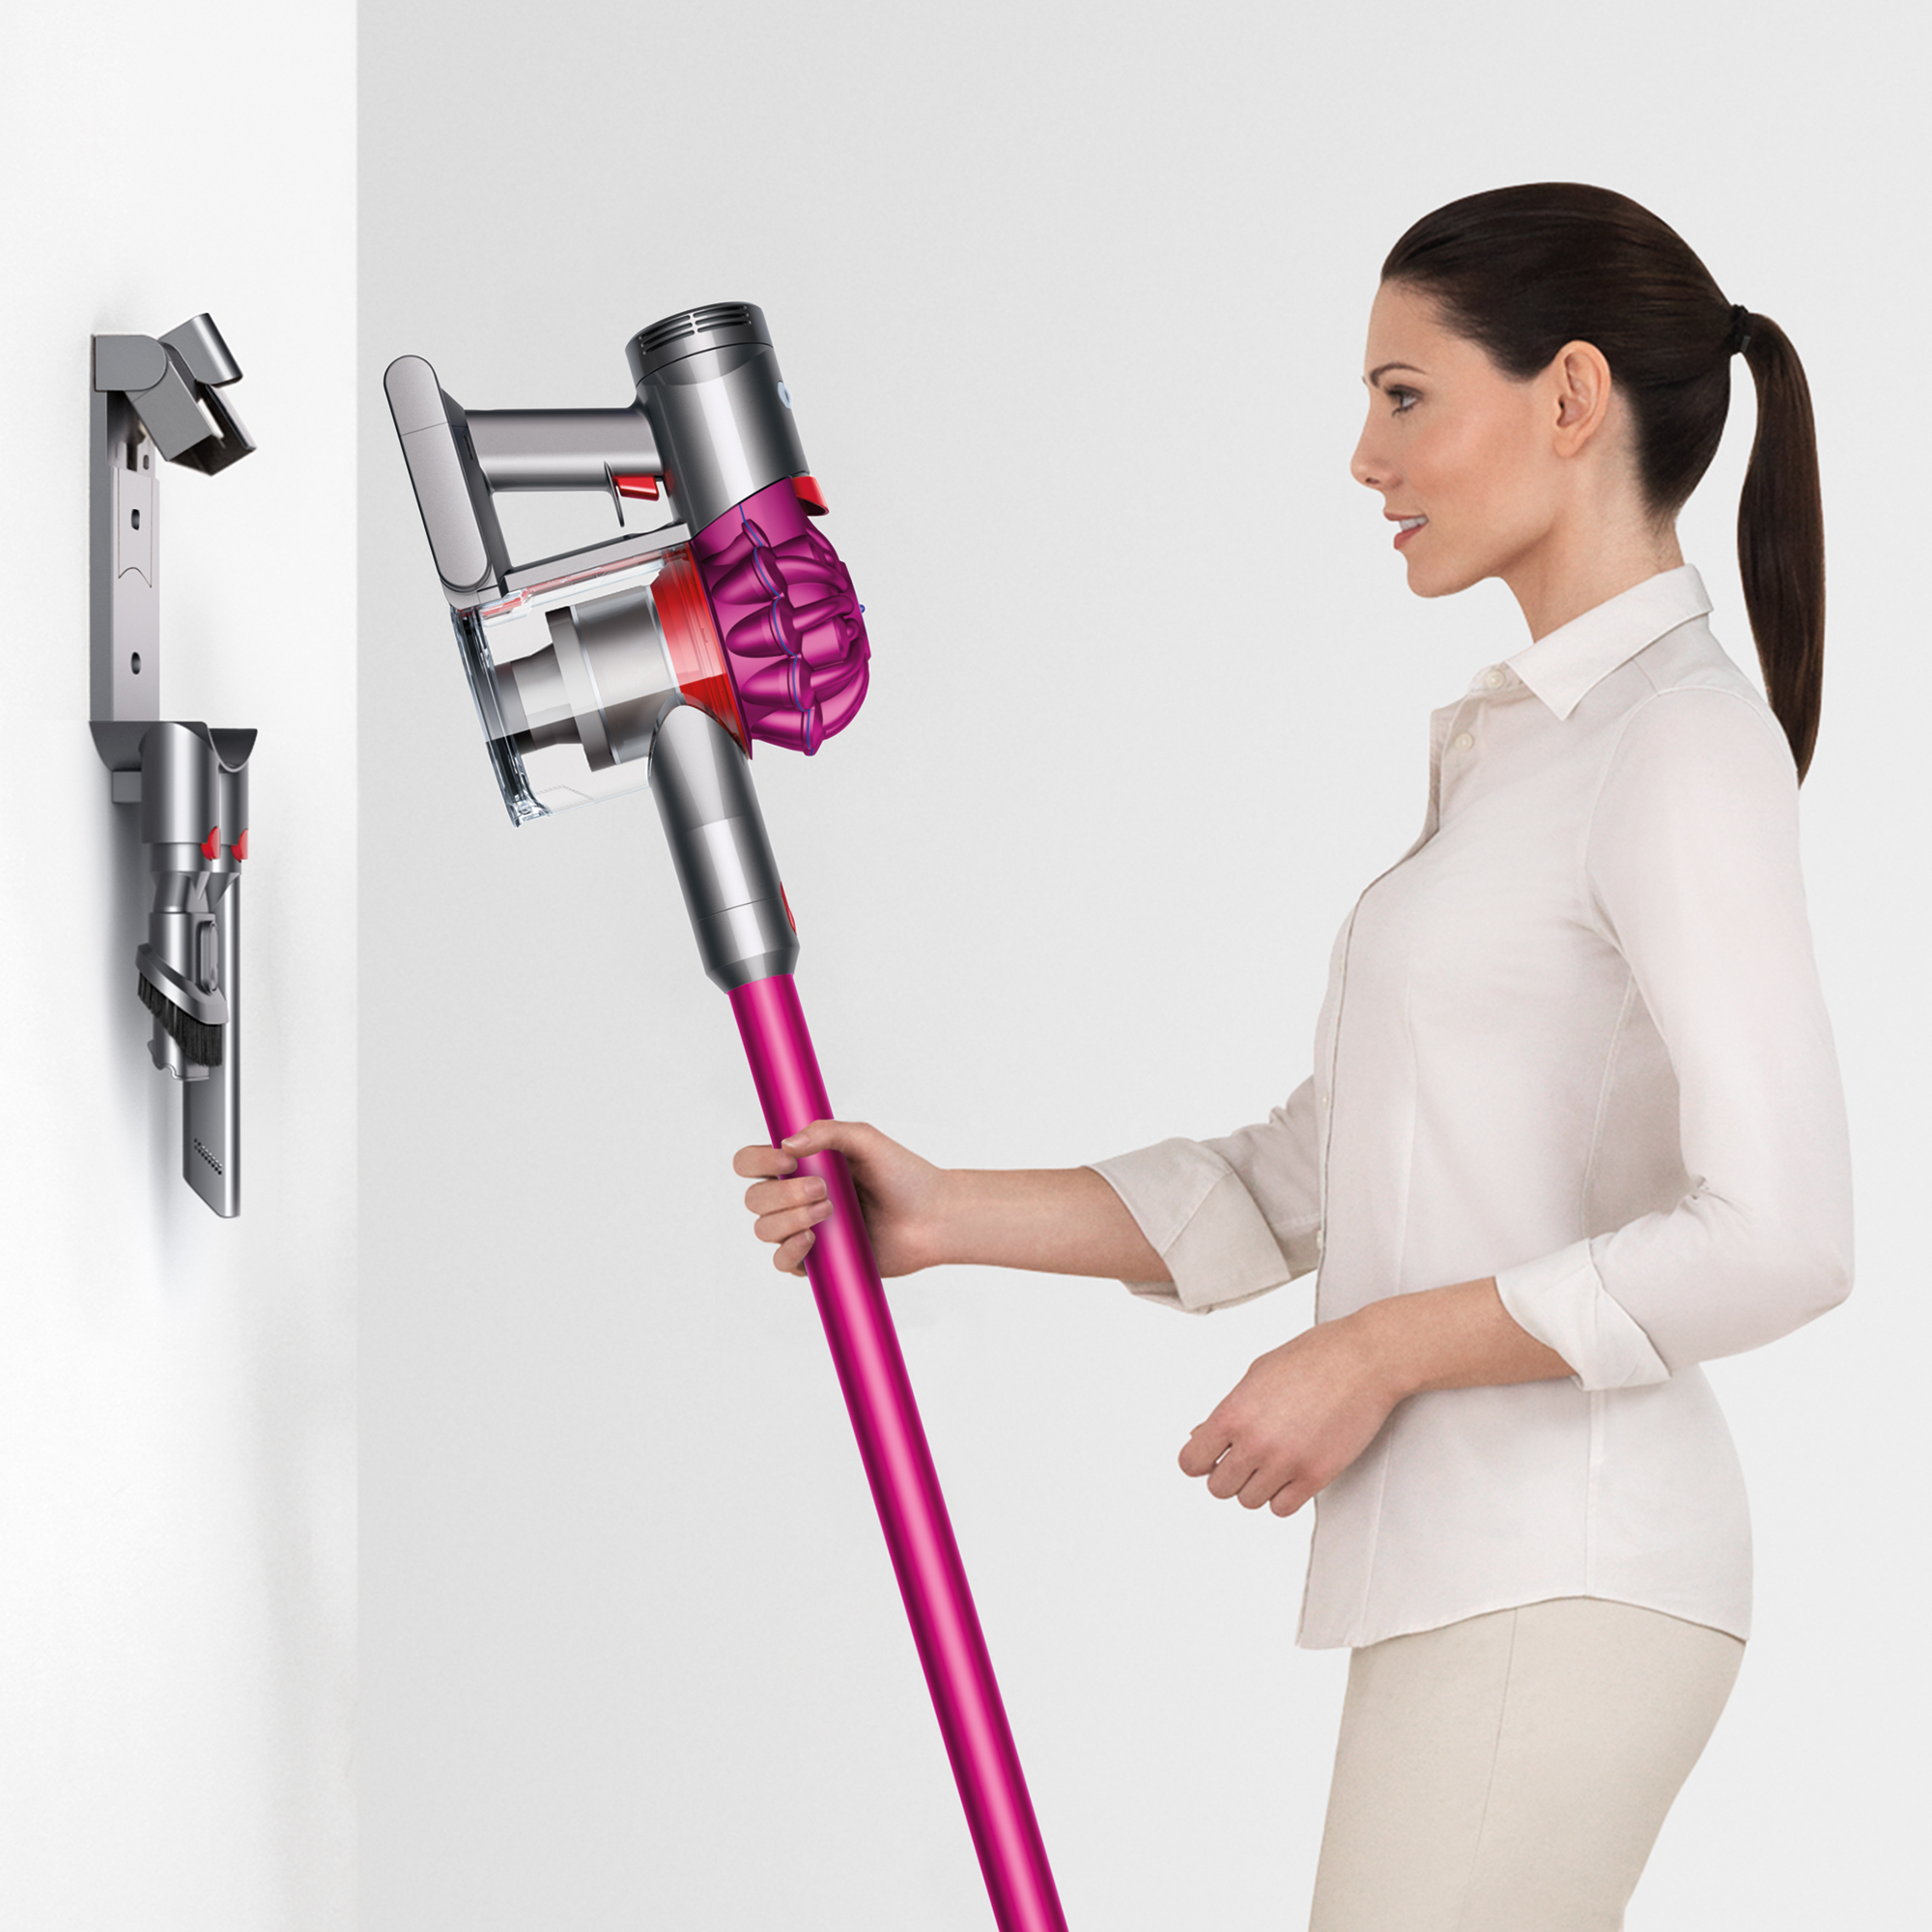 Dyson-V7-Animal-Cordless-HEPA-Vacuum-with-Bonus-Tools-New thumbnail 10